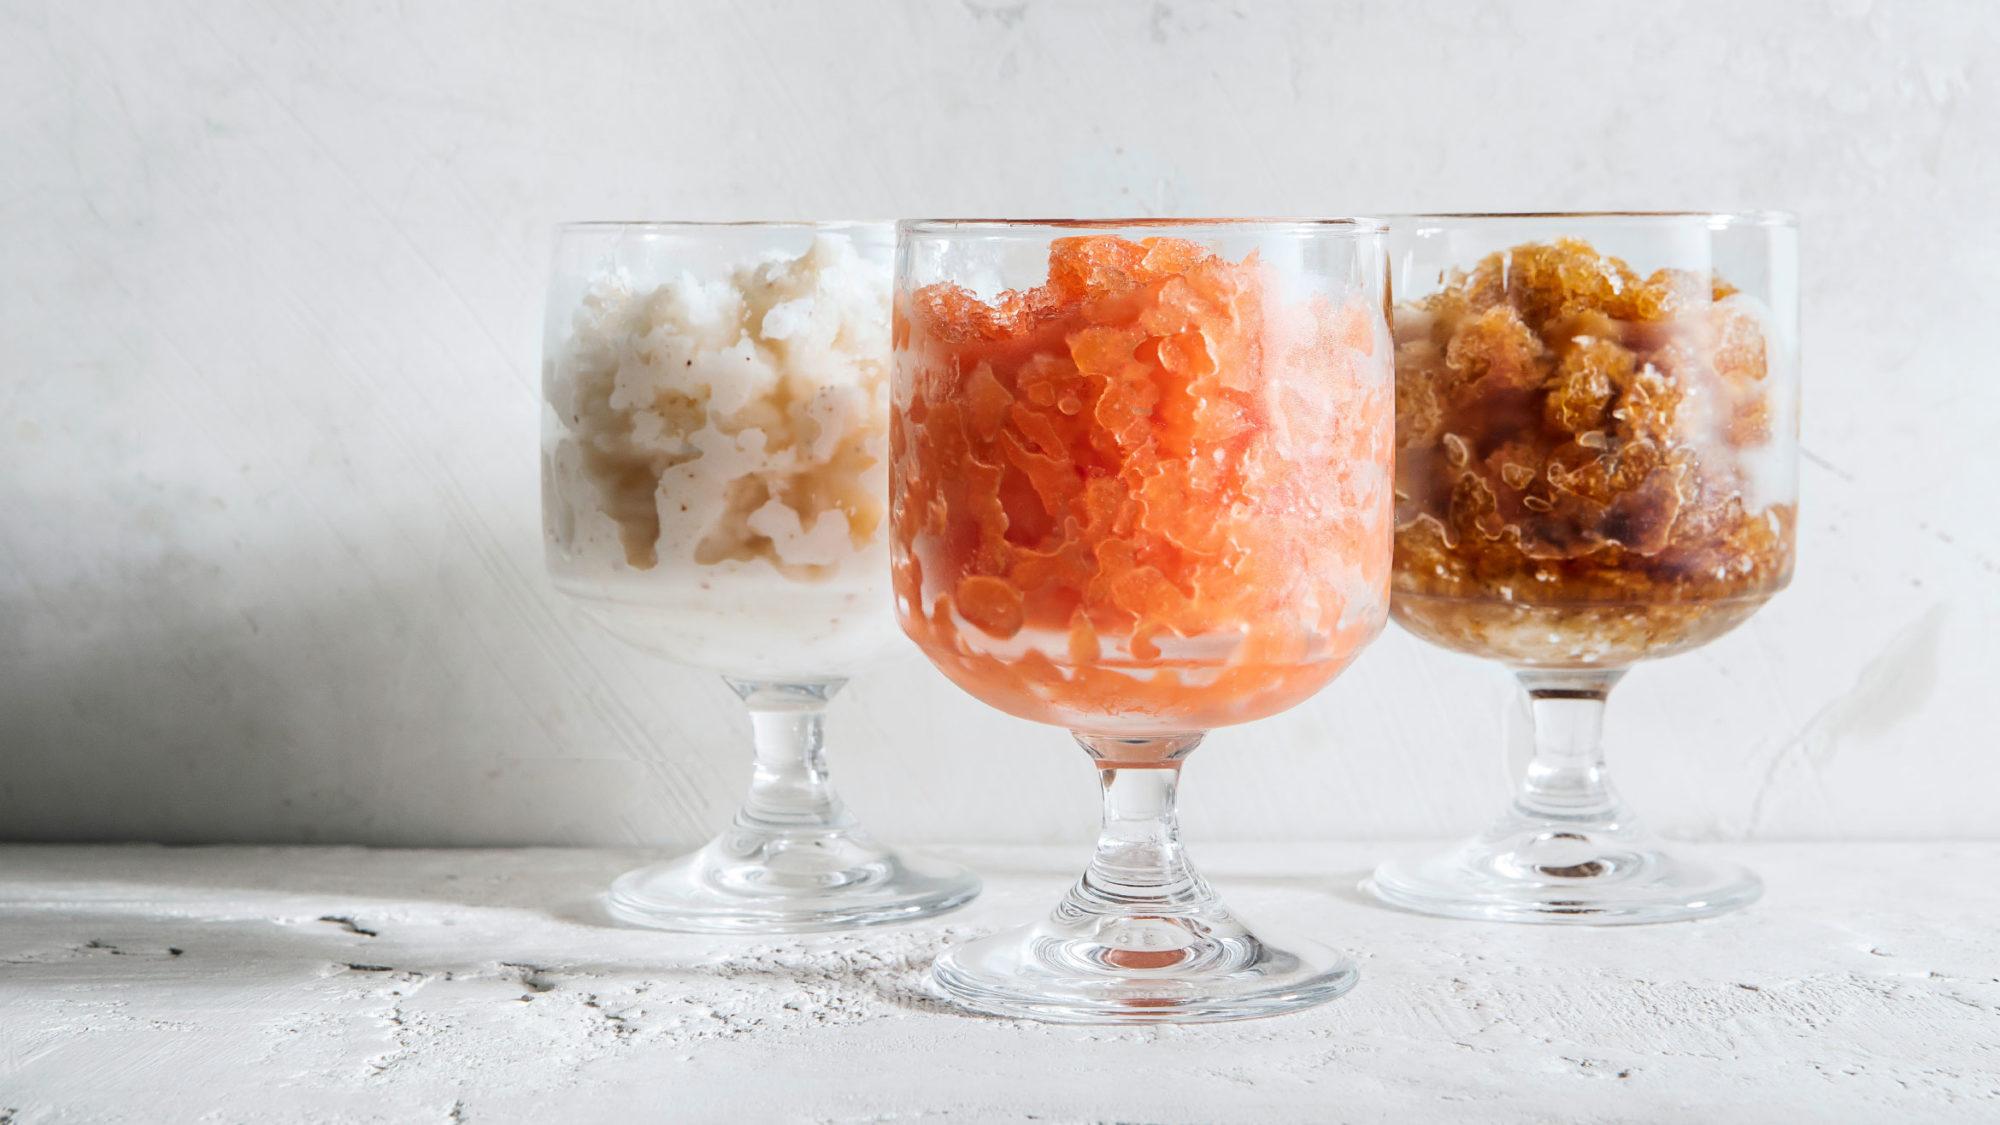 Article-Coffee-Almond-Peach-Granita-Dessert-Recipe6